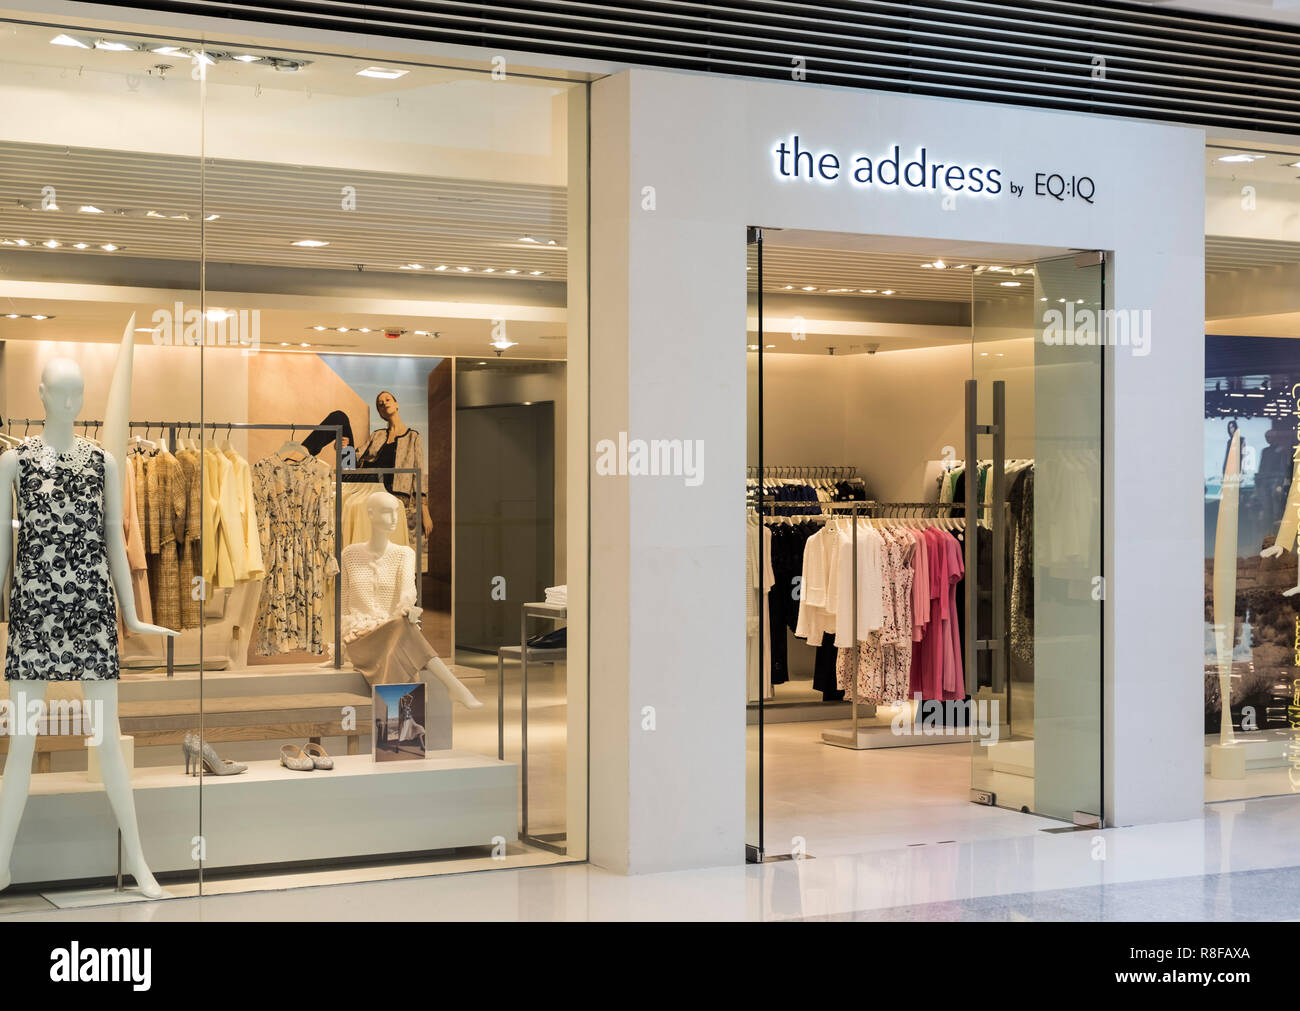 Hong Kong, April 7, 2019: The Address by EQ:IQ store in Hong Kong - Stock Image